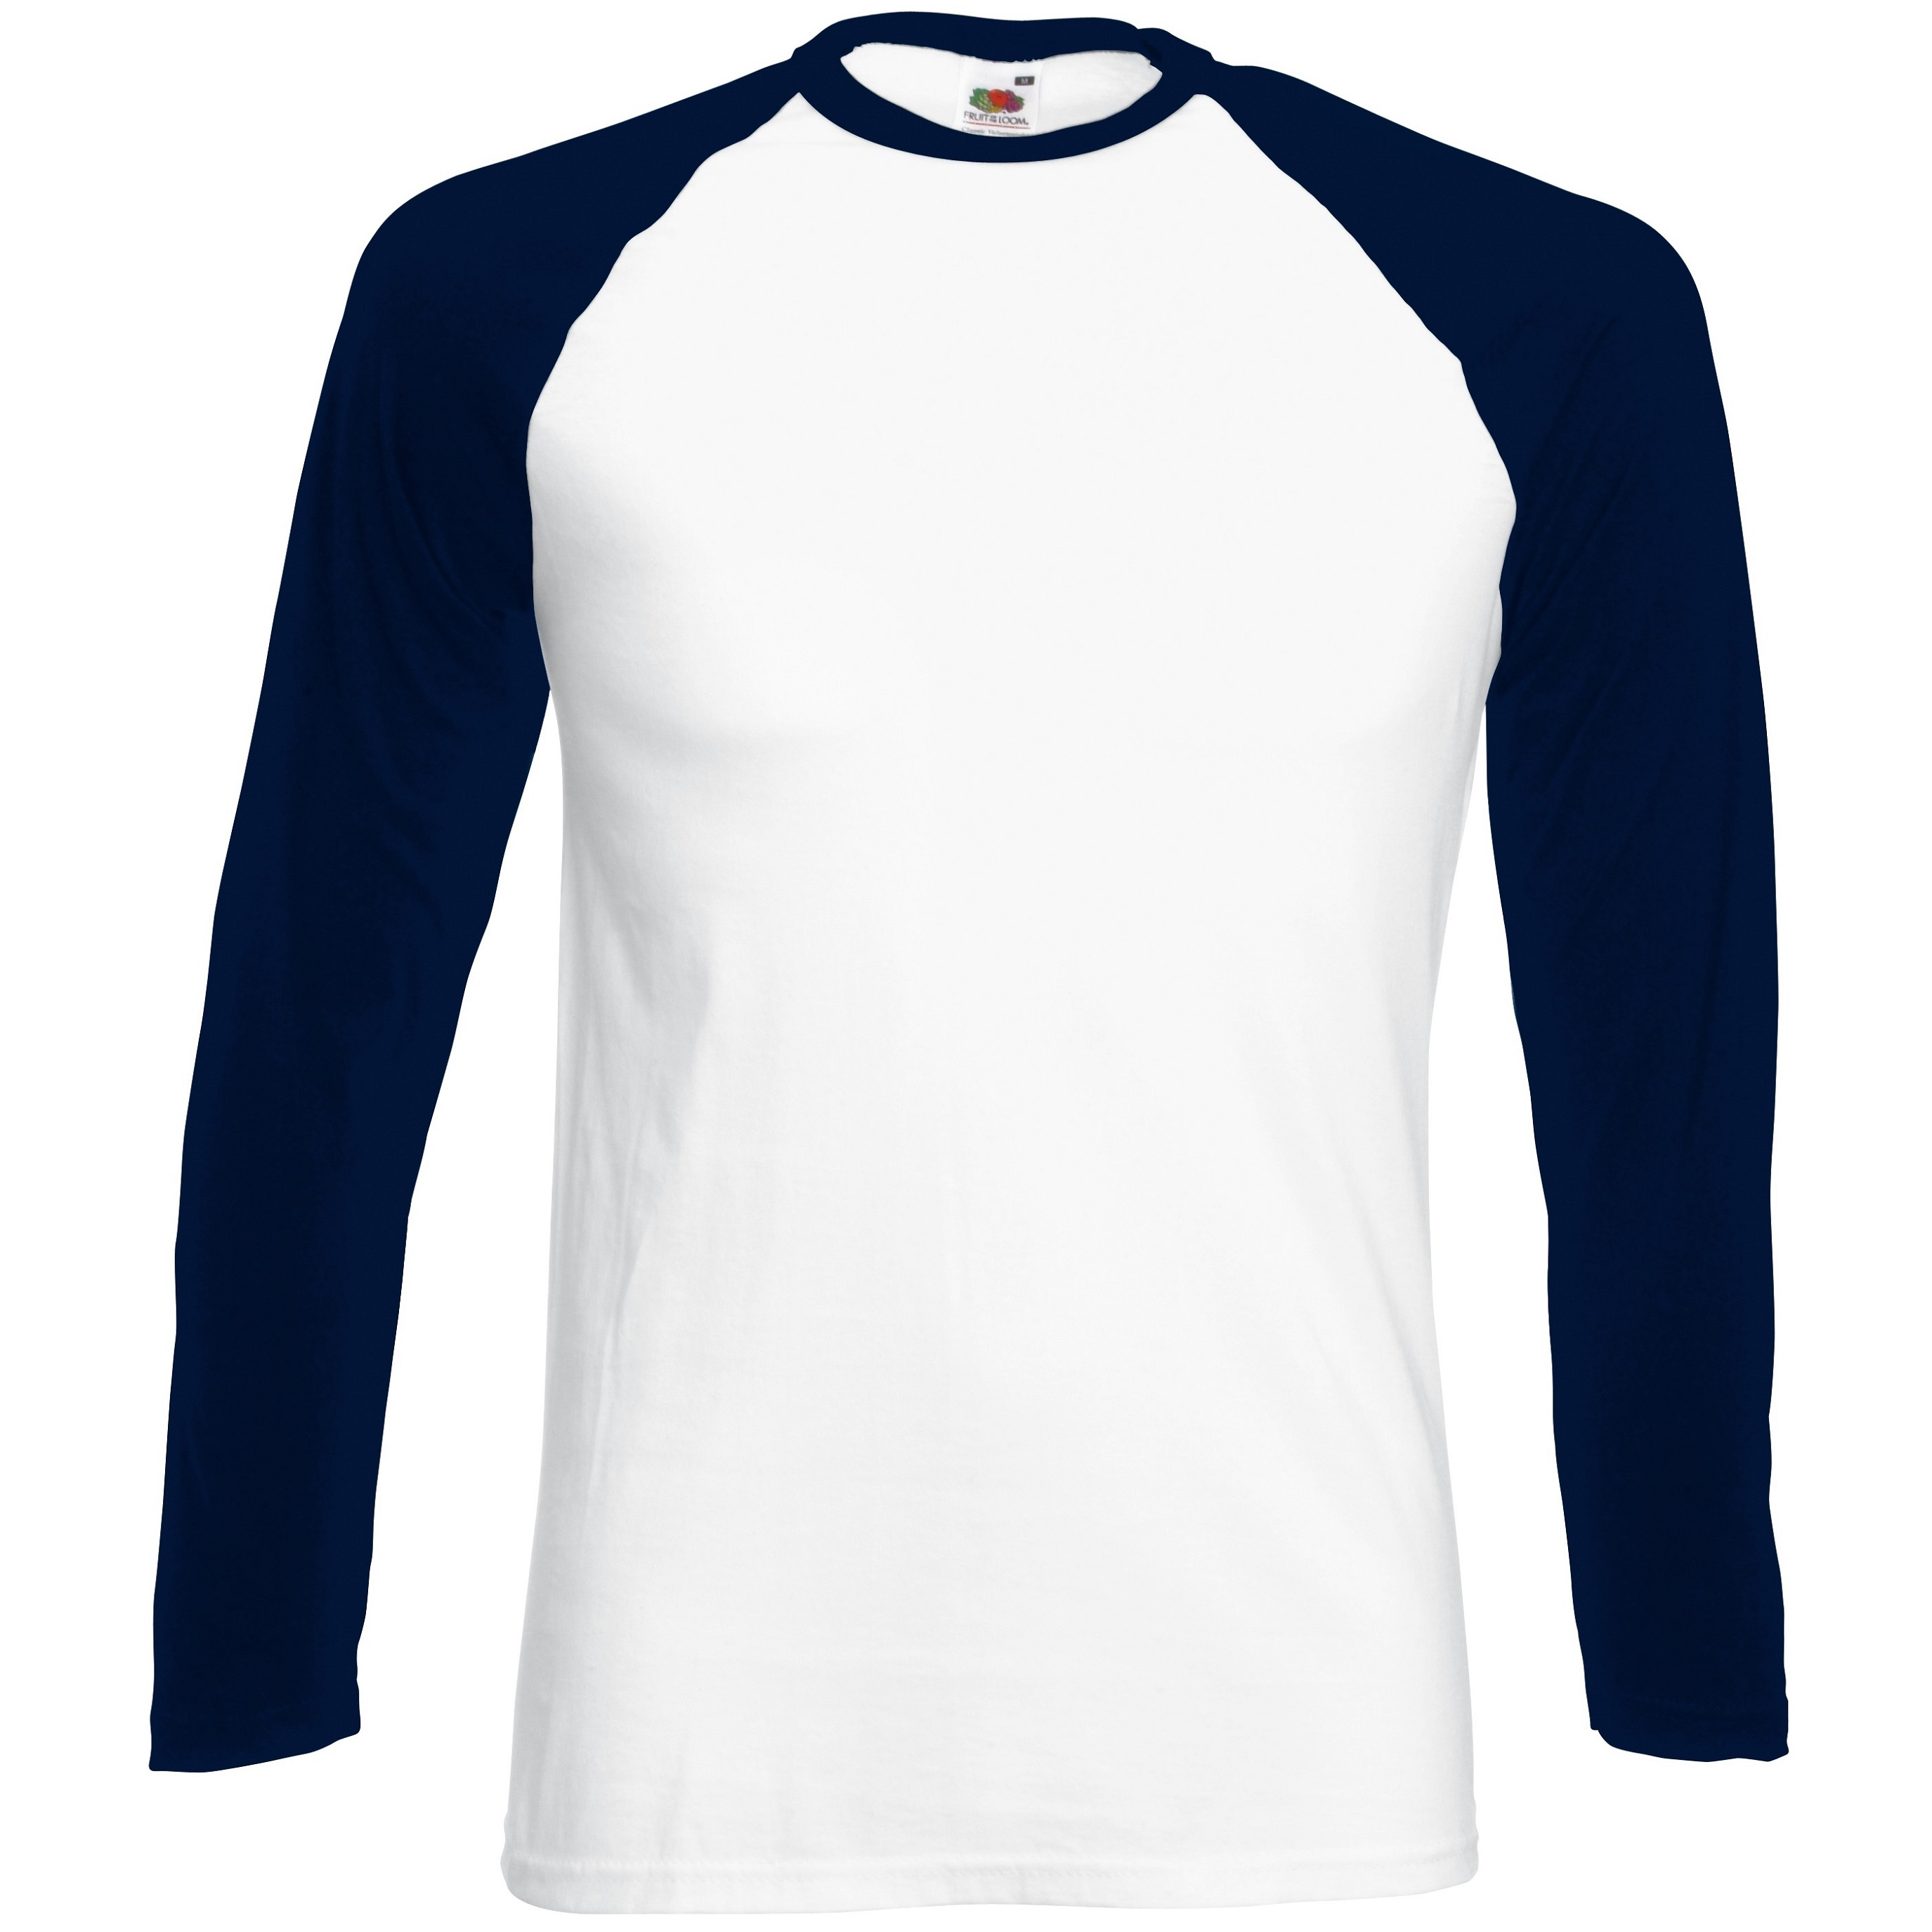 sale retailer cff93 372ae SS028 Long Sleeve Baseball T-Shirt